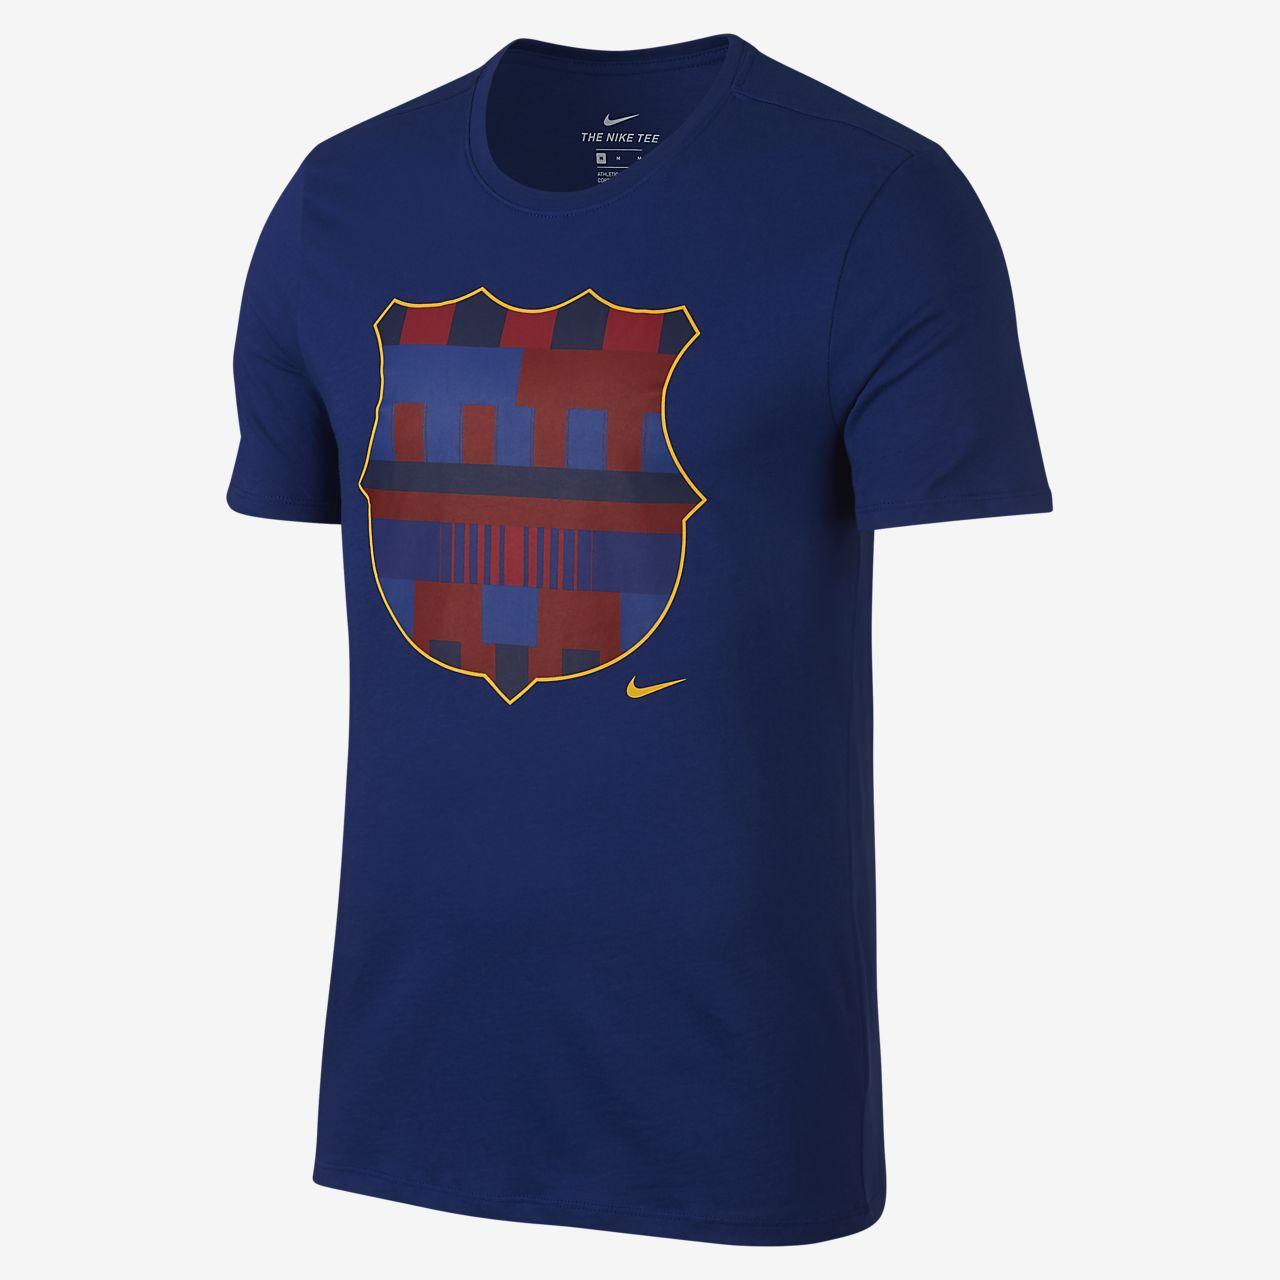 9d8264efa Fc Barcelona Nike Tee T Shirt - Querciacb